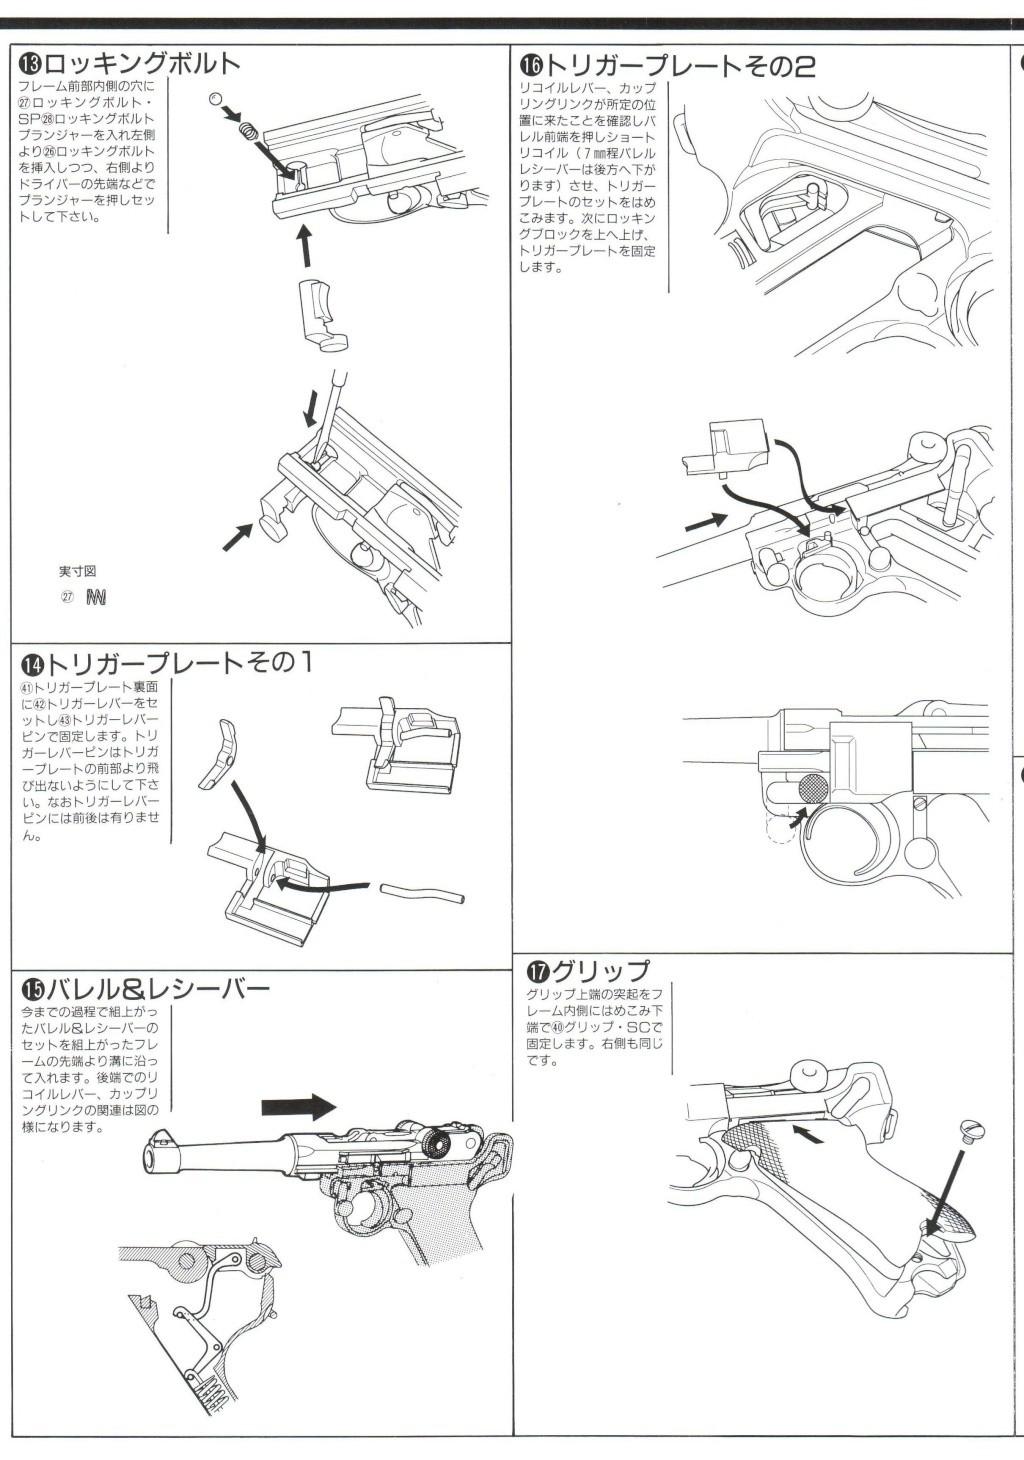 Marushin Metal KIT Dummy Cartridge Model LUGER P08 cal. 9 mm Instruction Manual E10